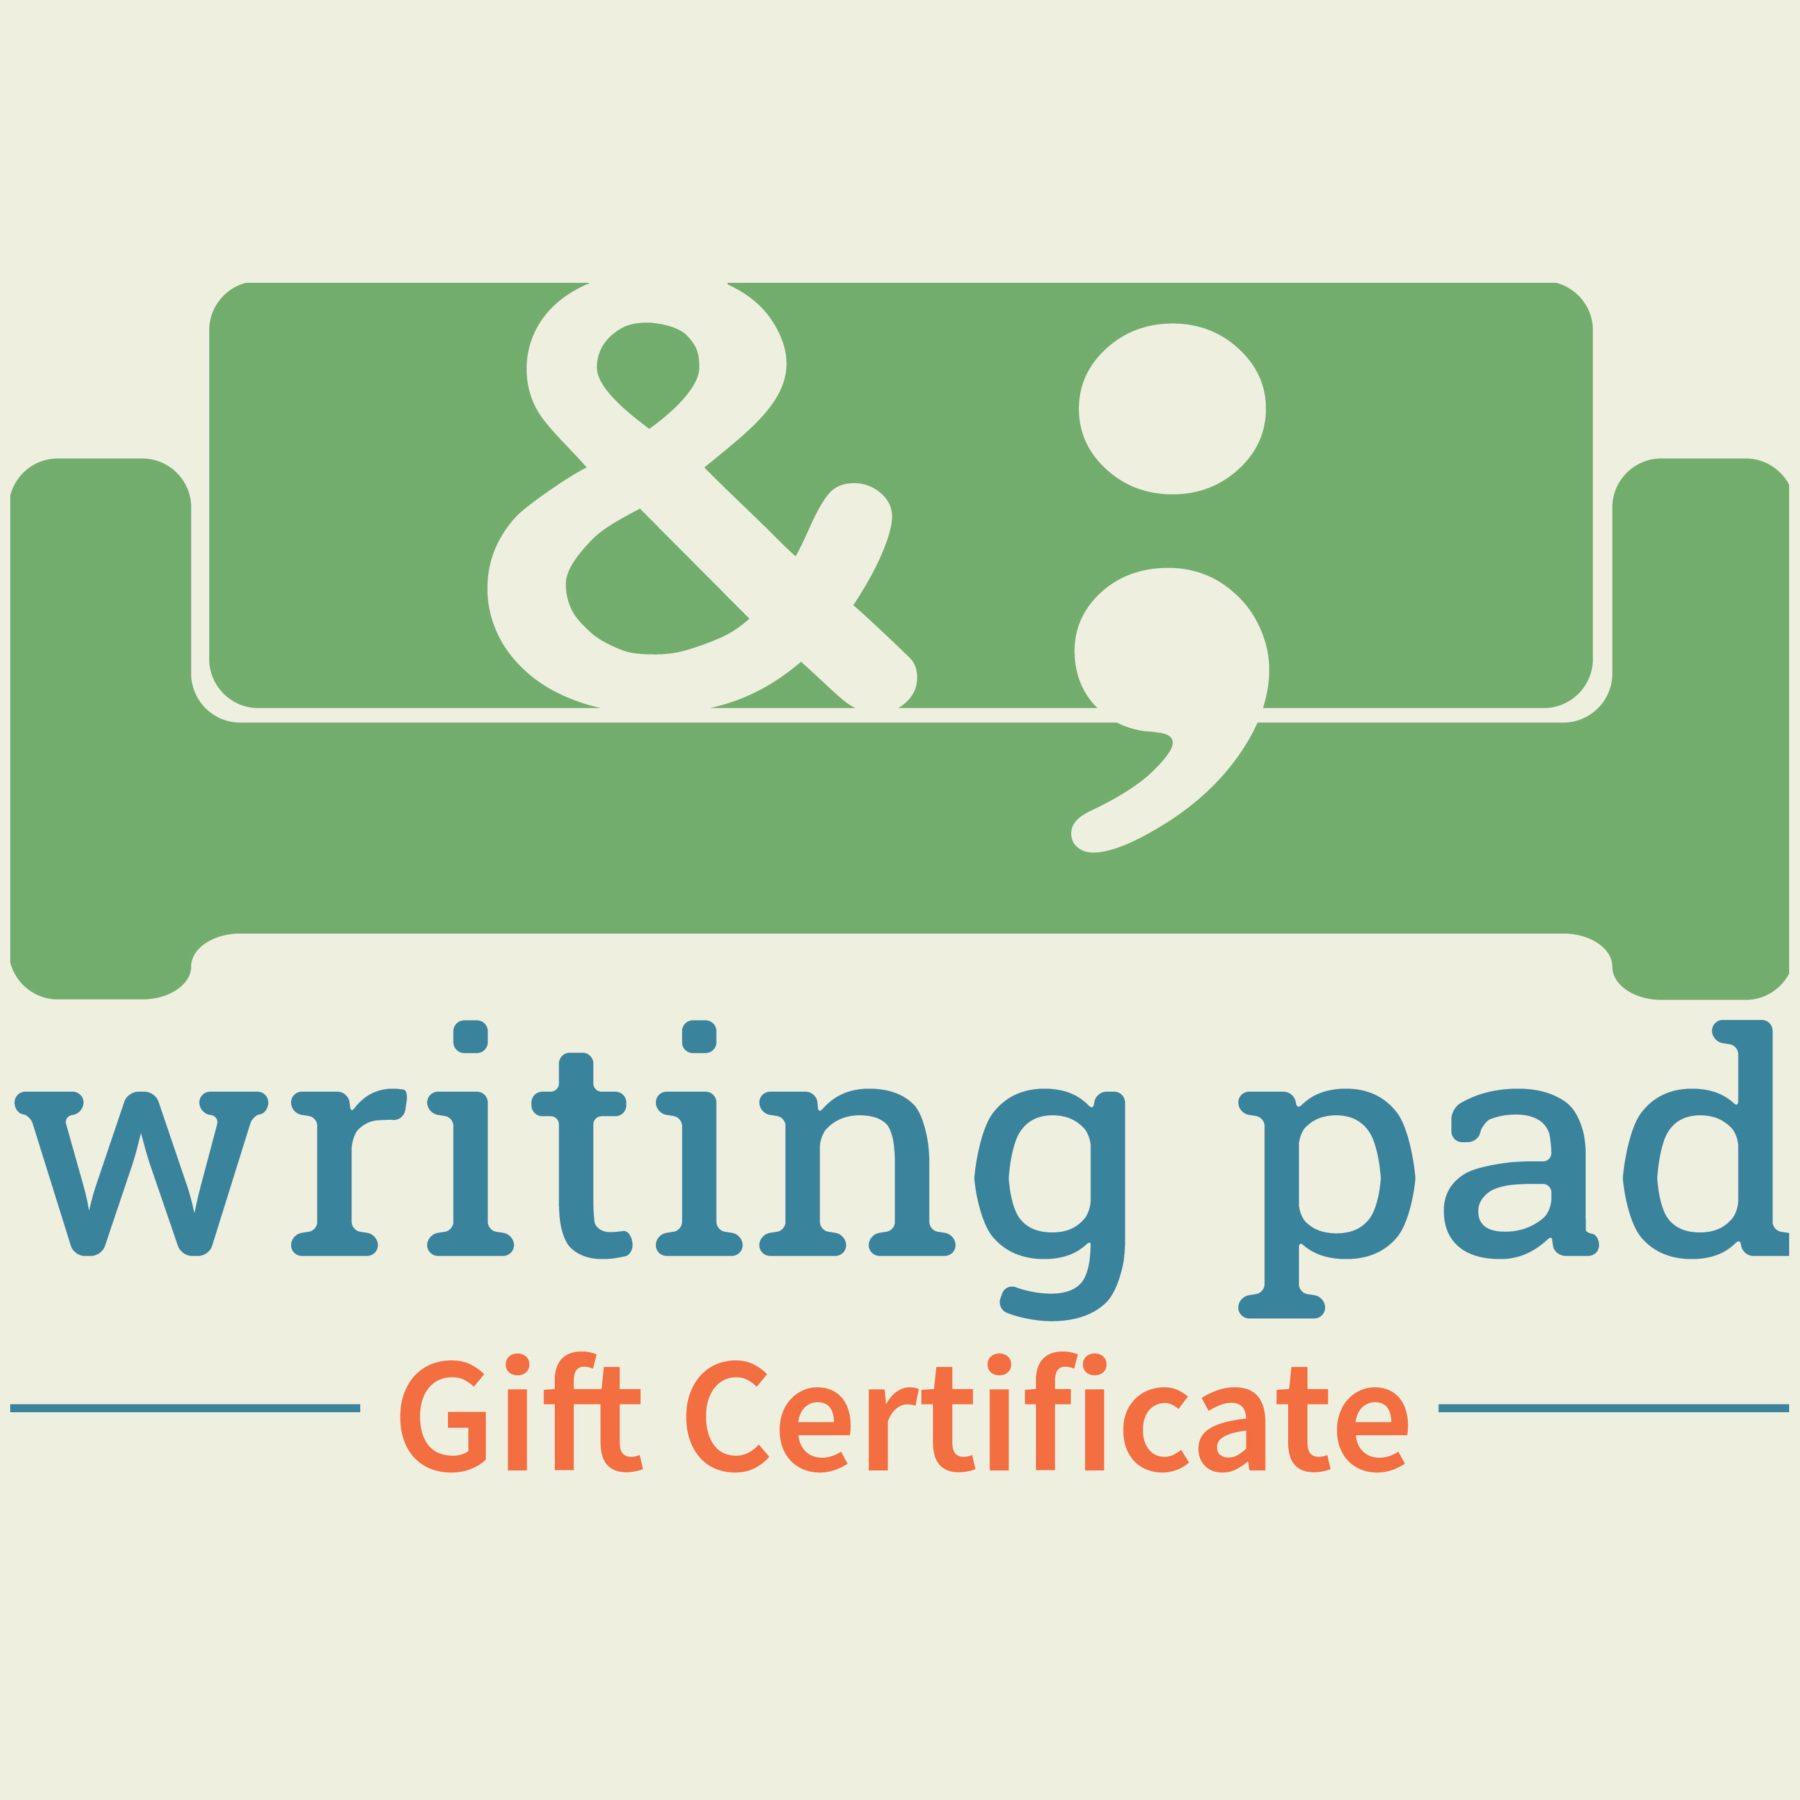 Writing Pad Gift Certificate Logo